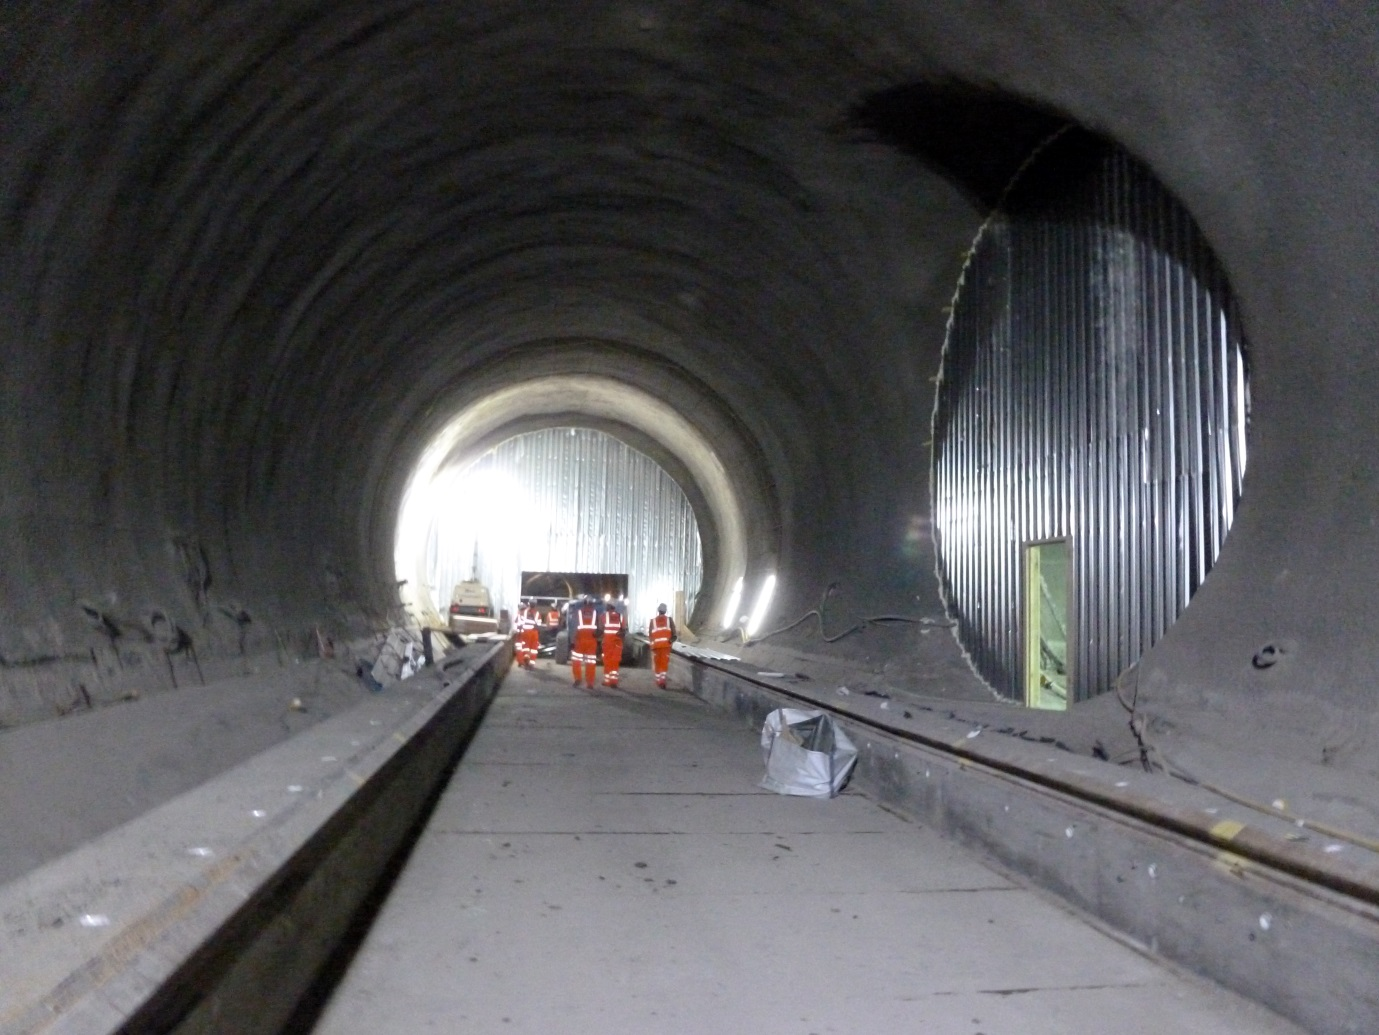 Figure 4.8 - Temporary Bulkheads for Ventilation Tunnel Ventilation